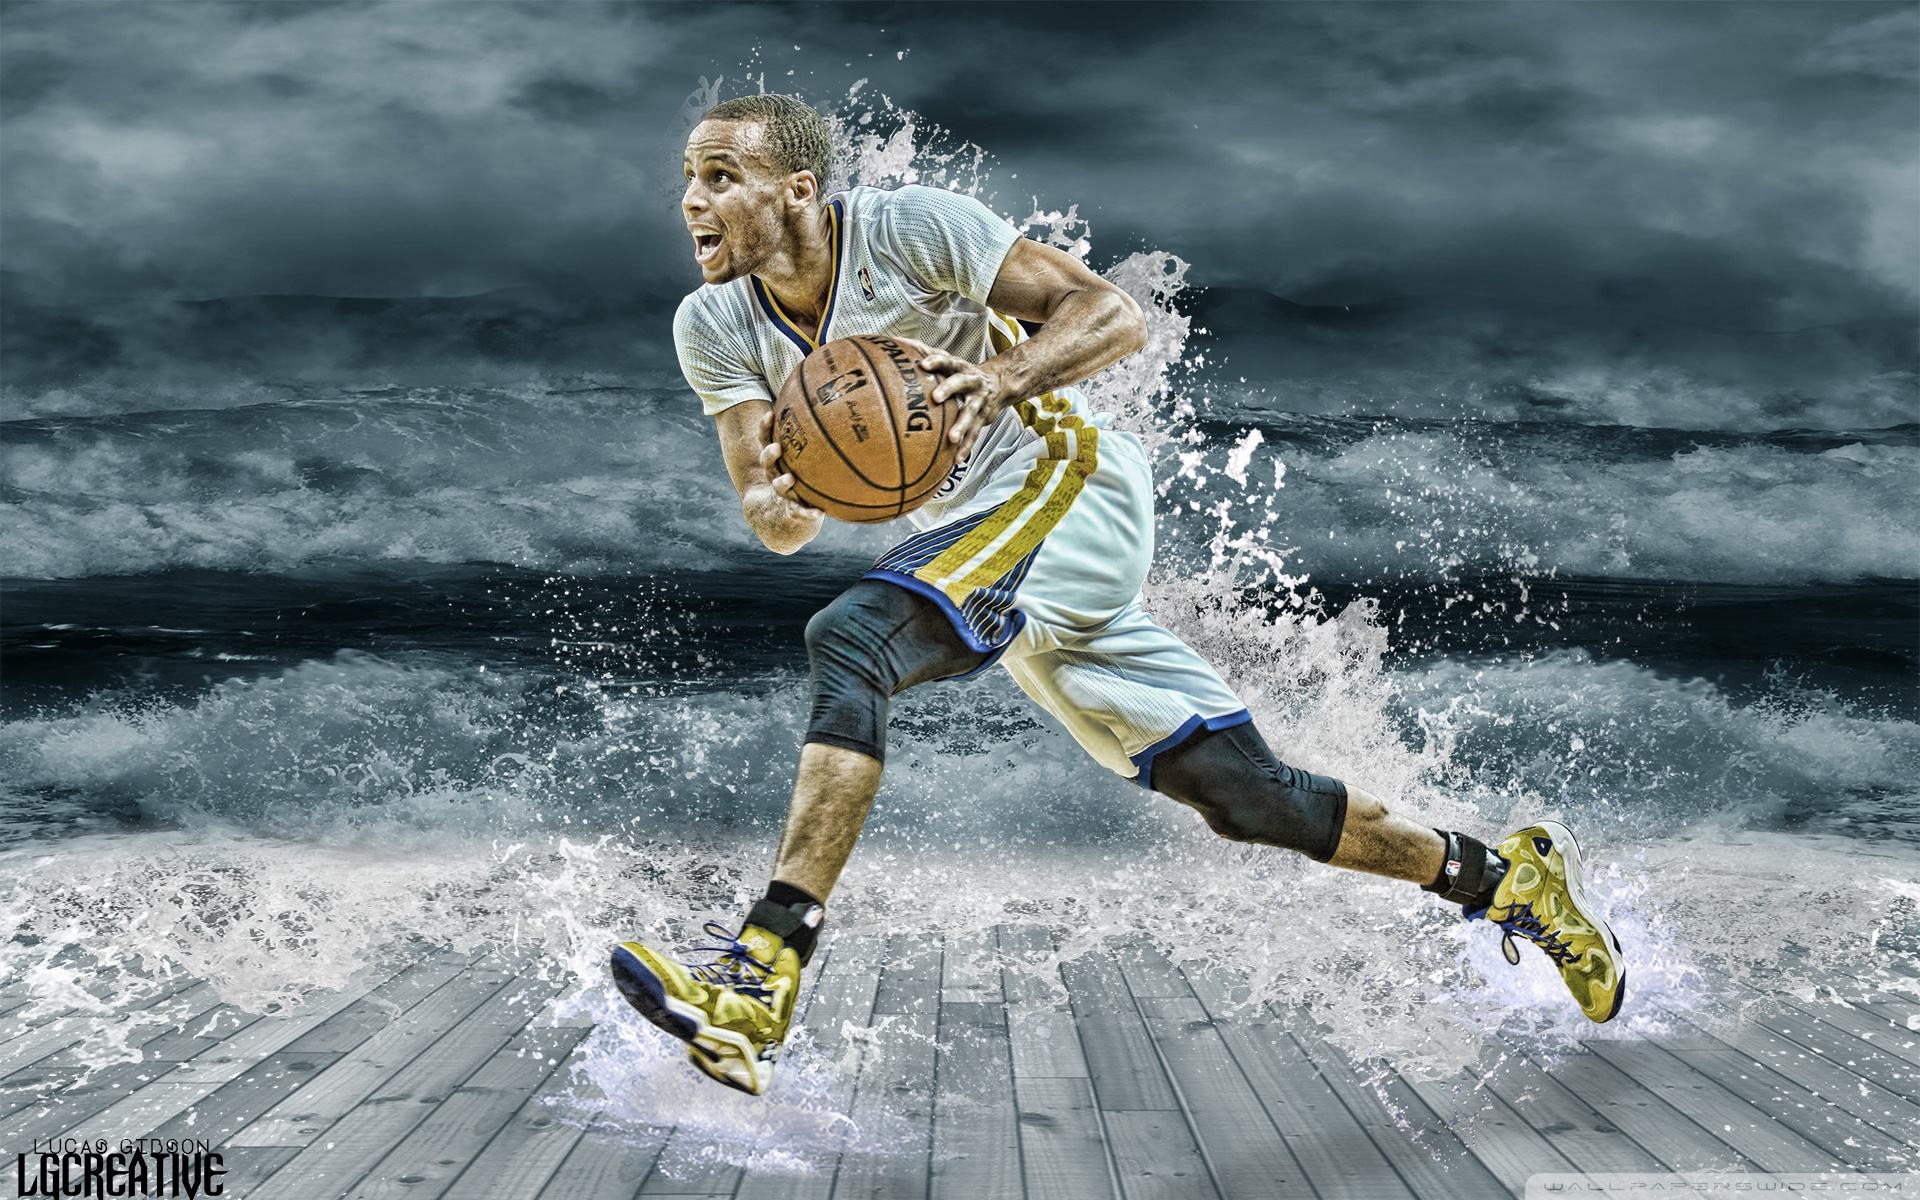 Free Stephen Curry Splash phone wallpaper by rhall01